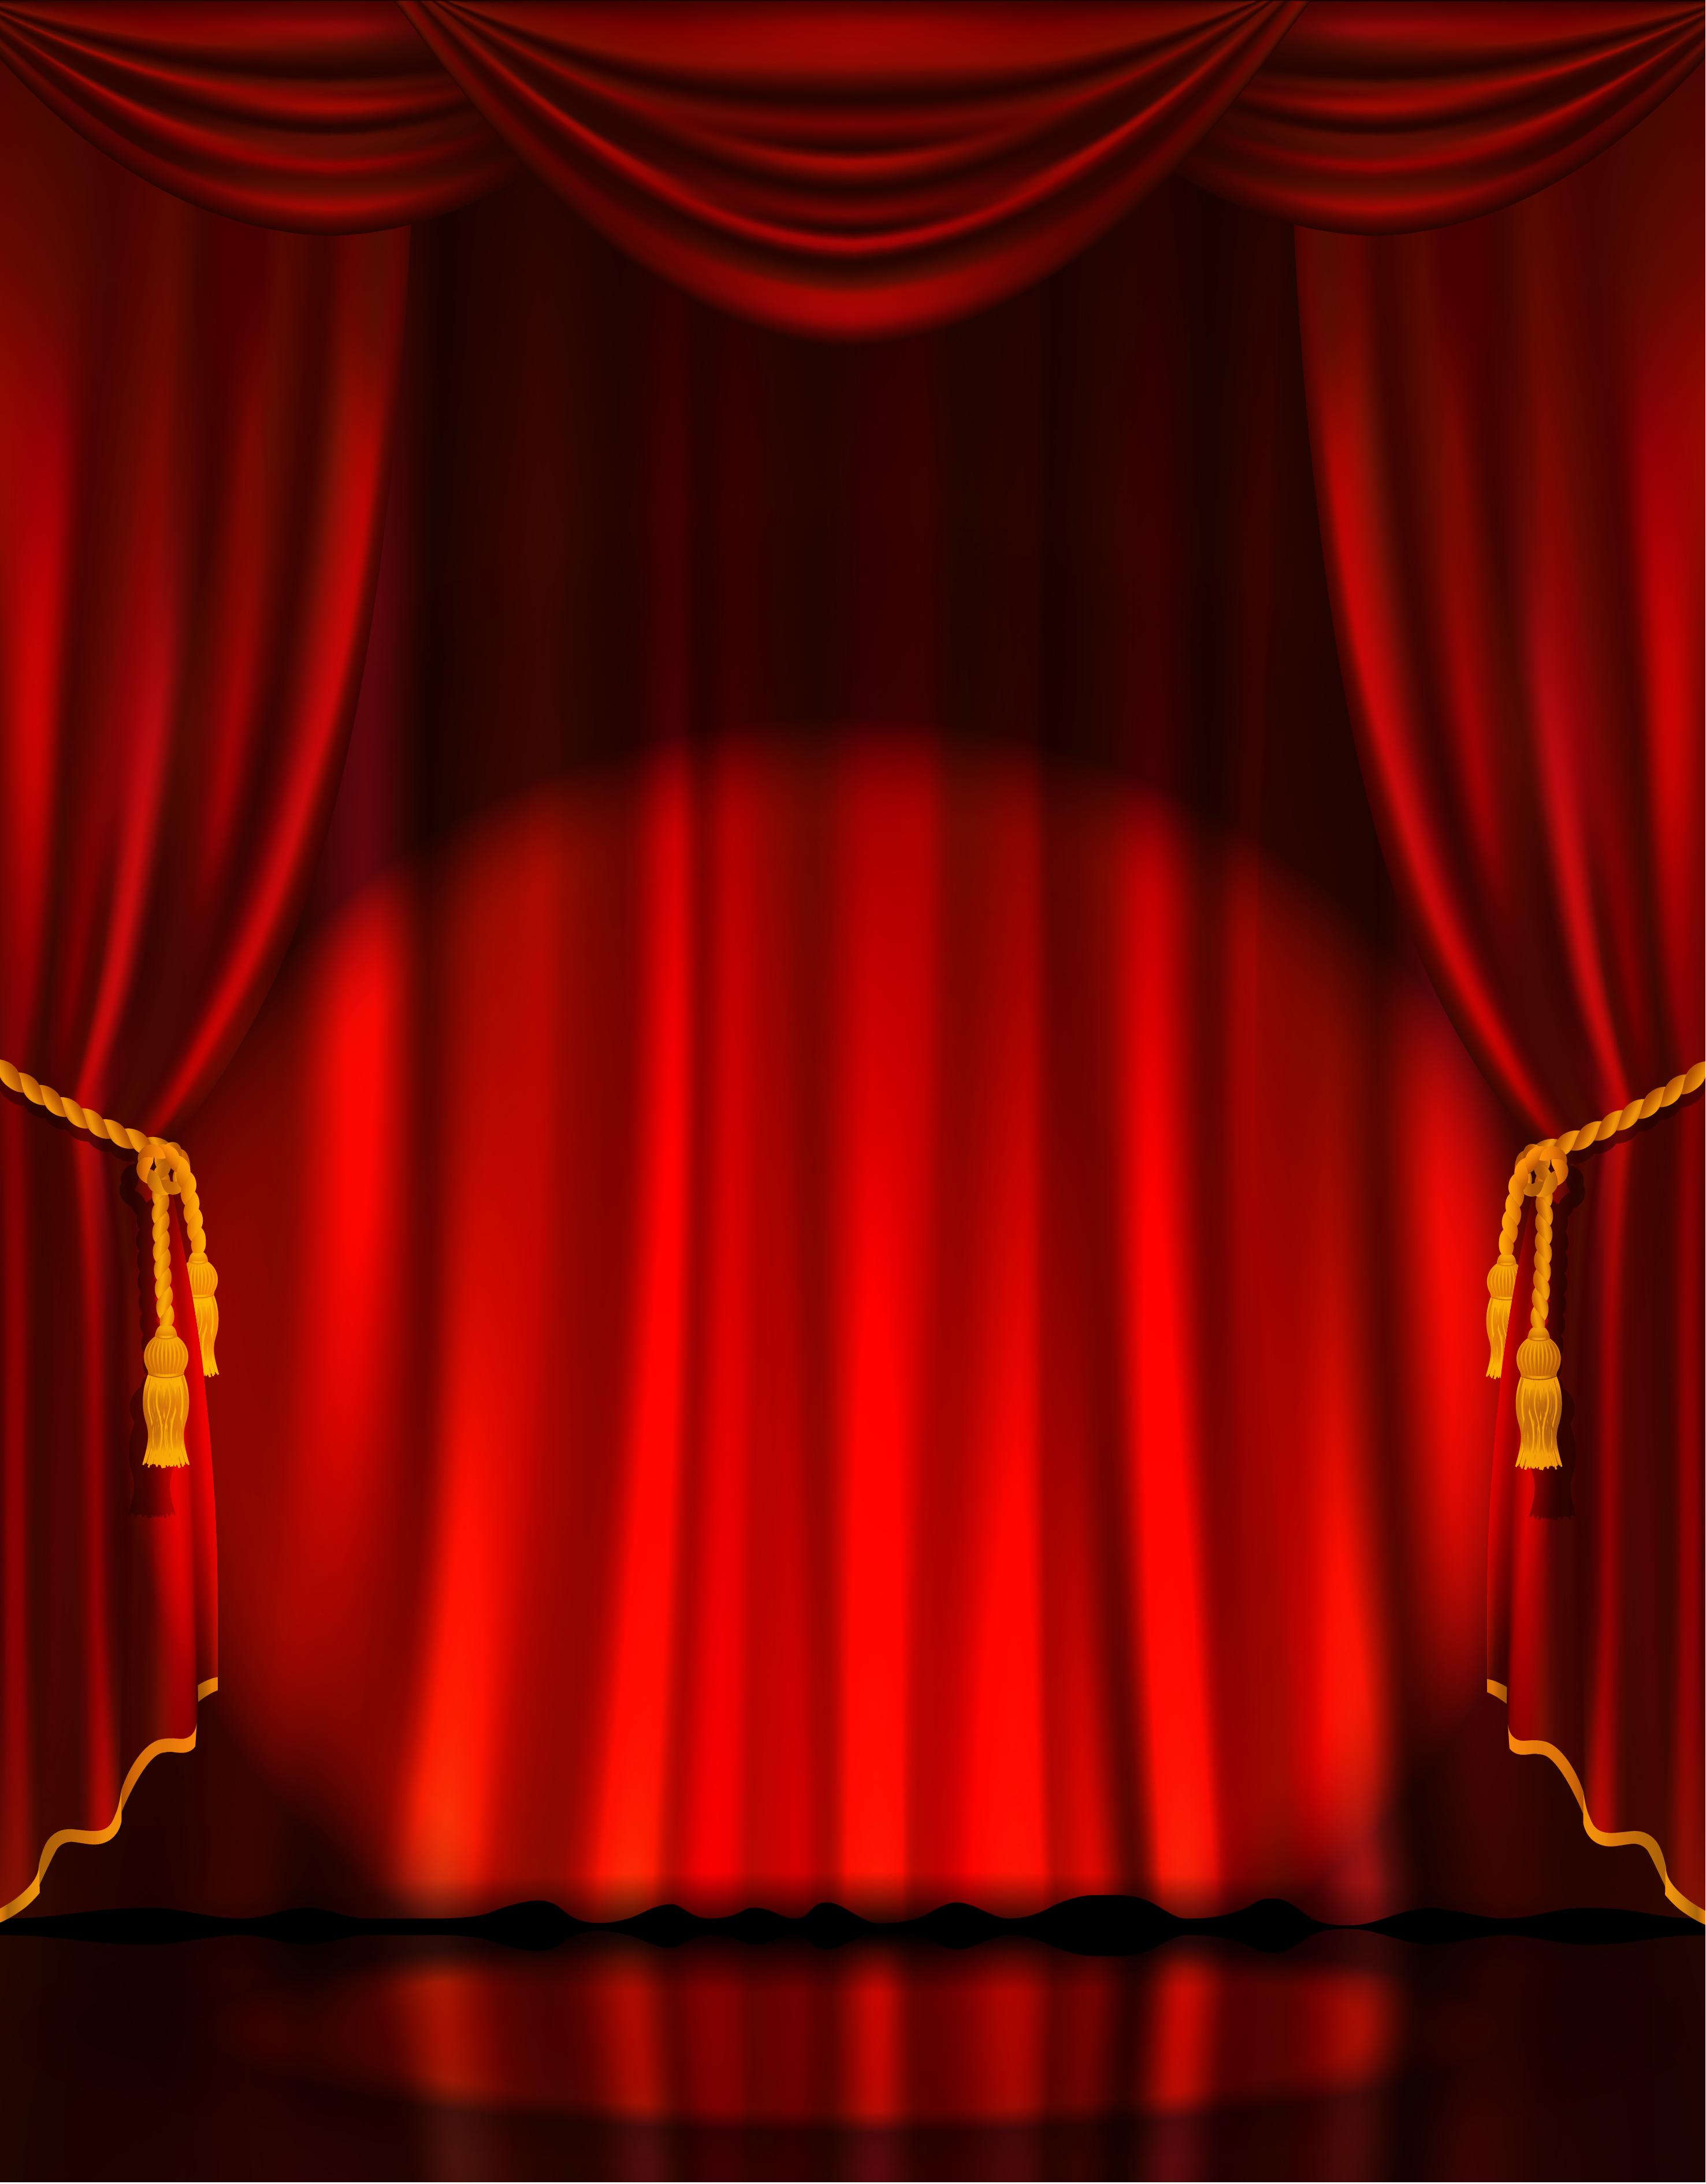 le rideau de sc u00e8ne d arri u00e8re plan de lumi u00e8re rouge r u00eave